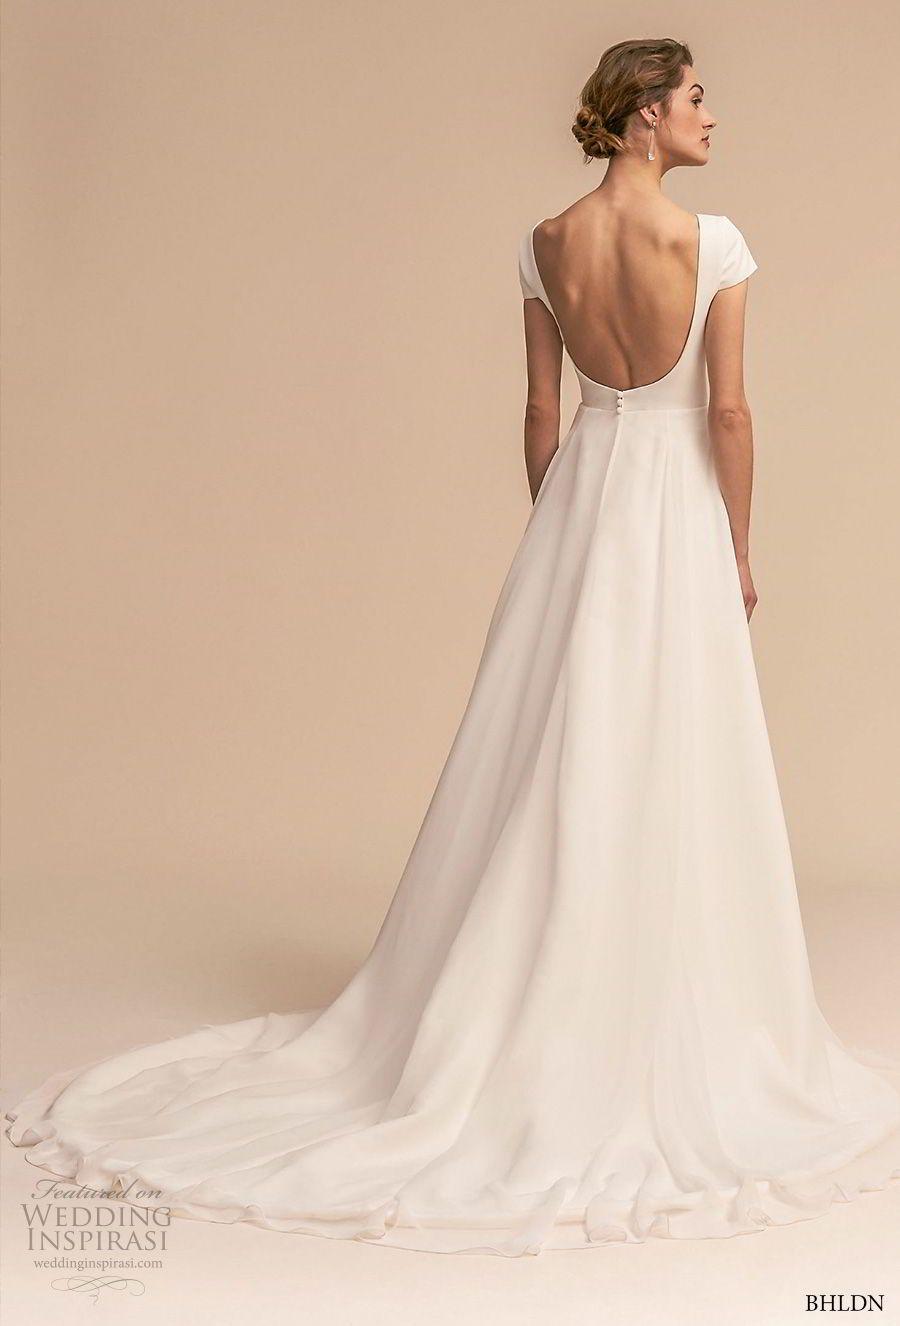 Bhldn 2018 Whispers Bridal Short Sleeve Bateau Neck Simple Clean Elegant Classic A Line We Plain Wedding Dress Wedding Gown Backless Simple Wedding Dress Short [ 1326 x 900 Pixel ]